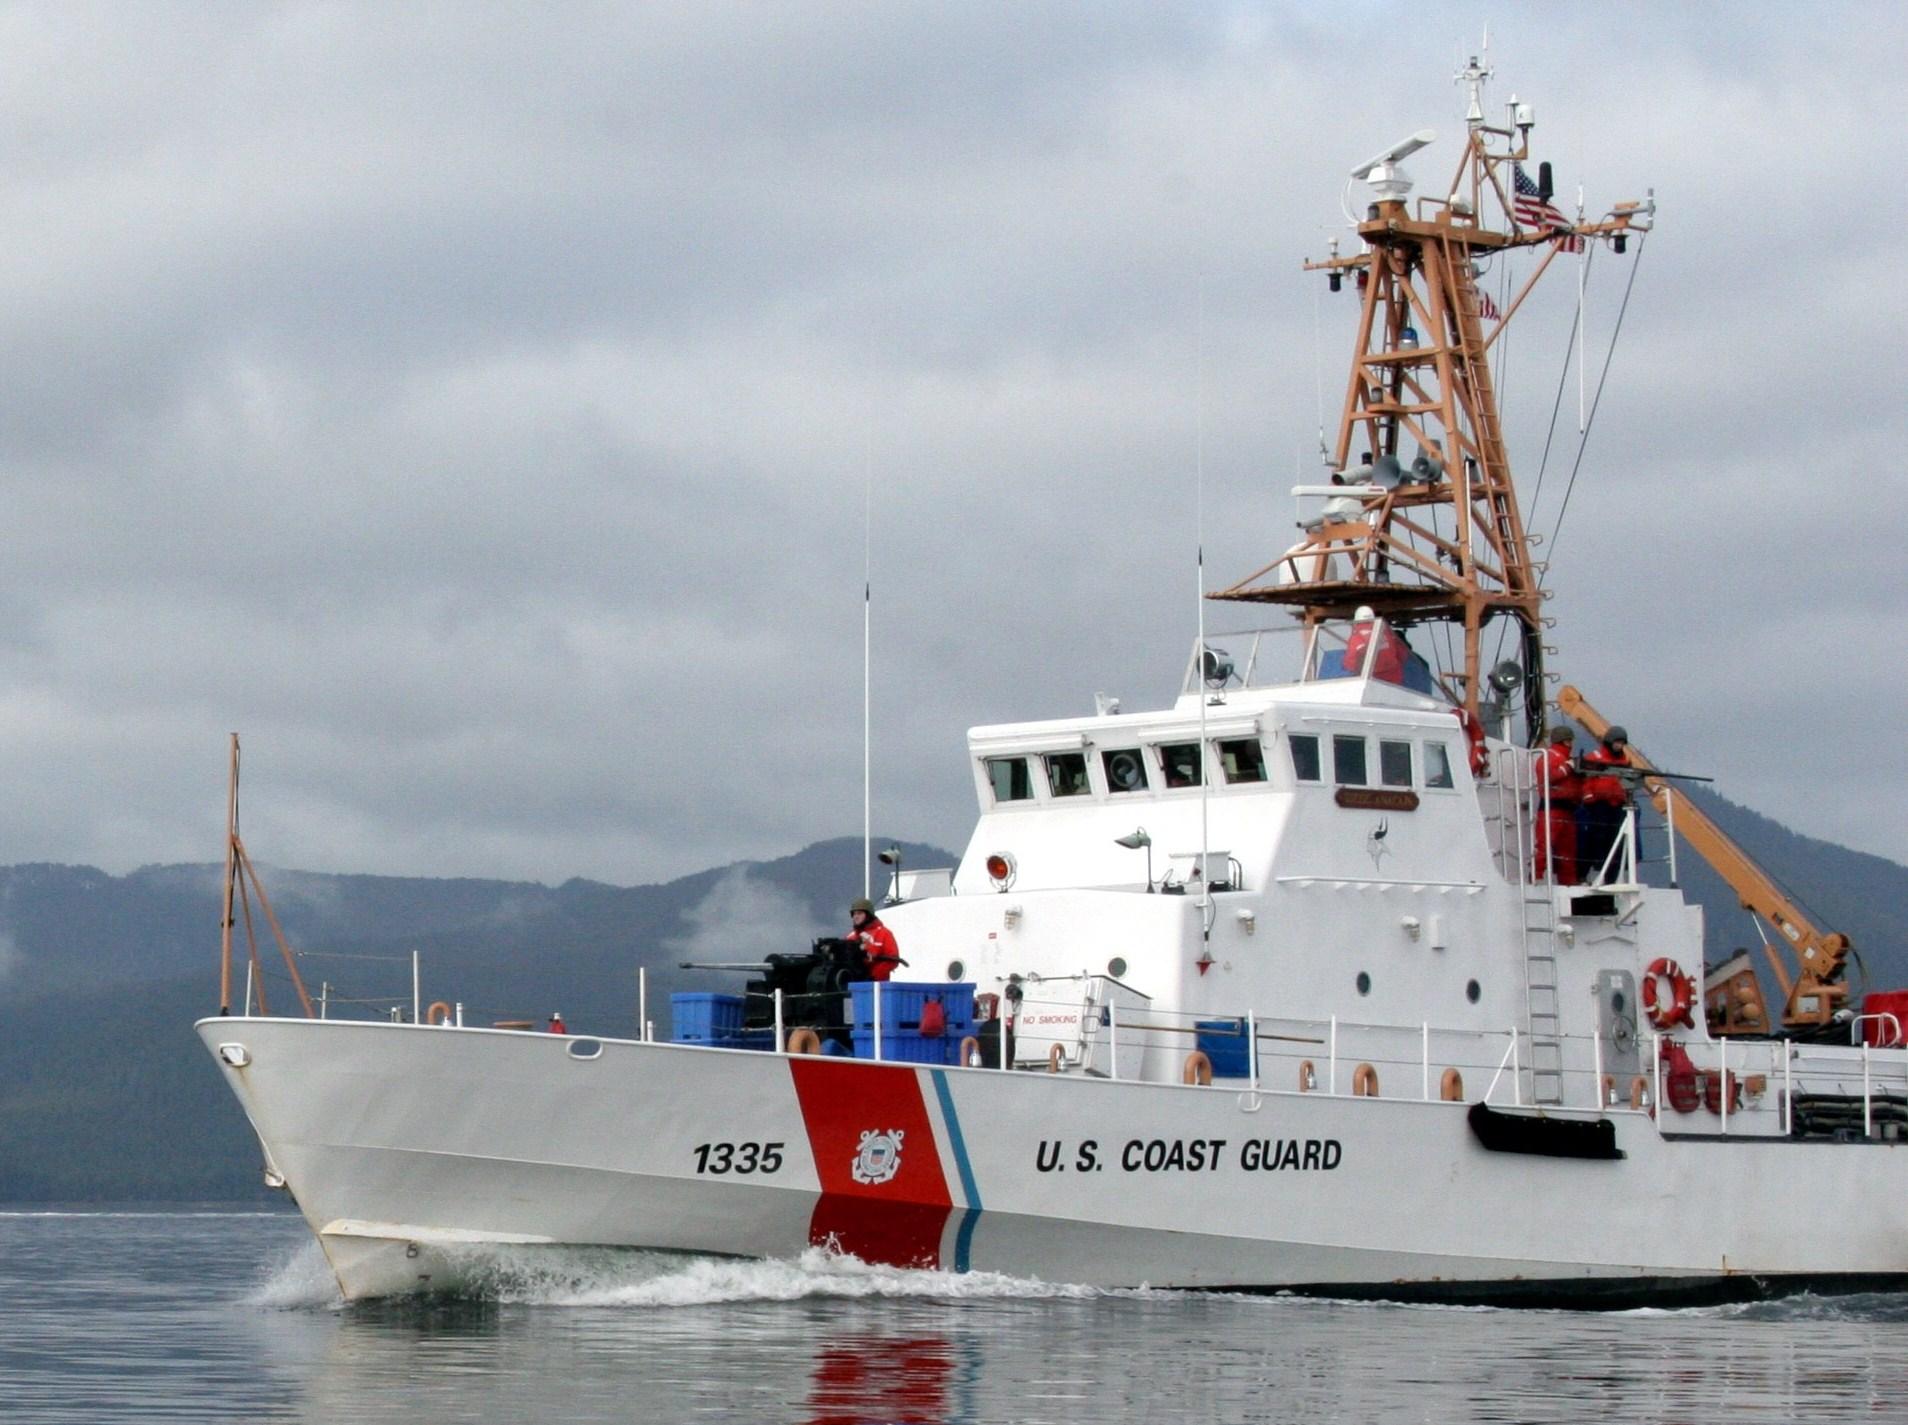 Coast Guard Coastguard Military Ship Boat Watercraft Wallpaper